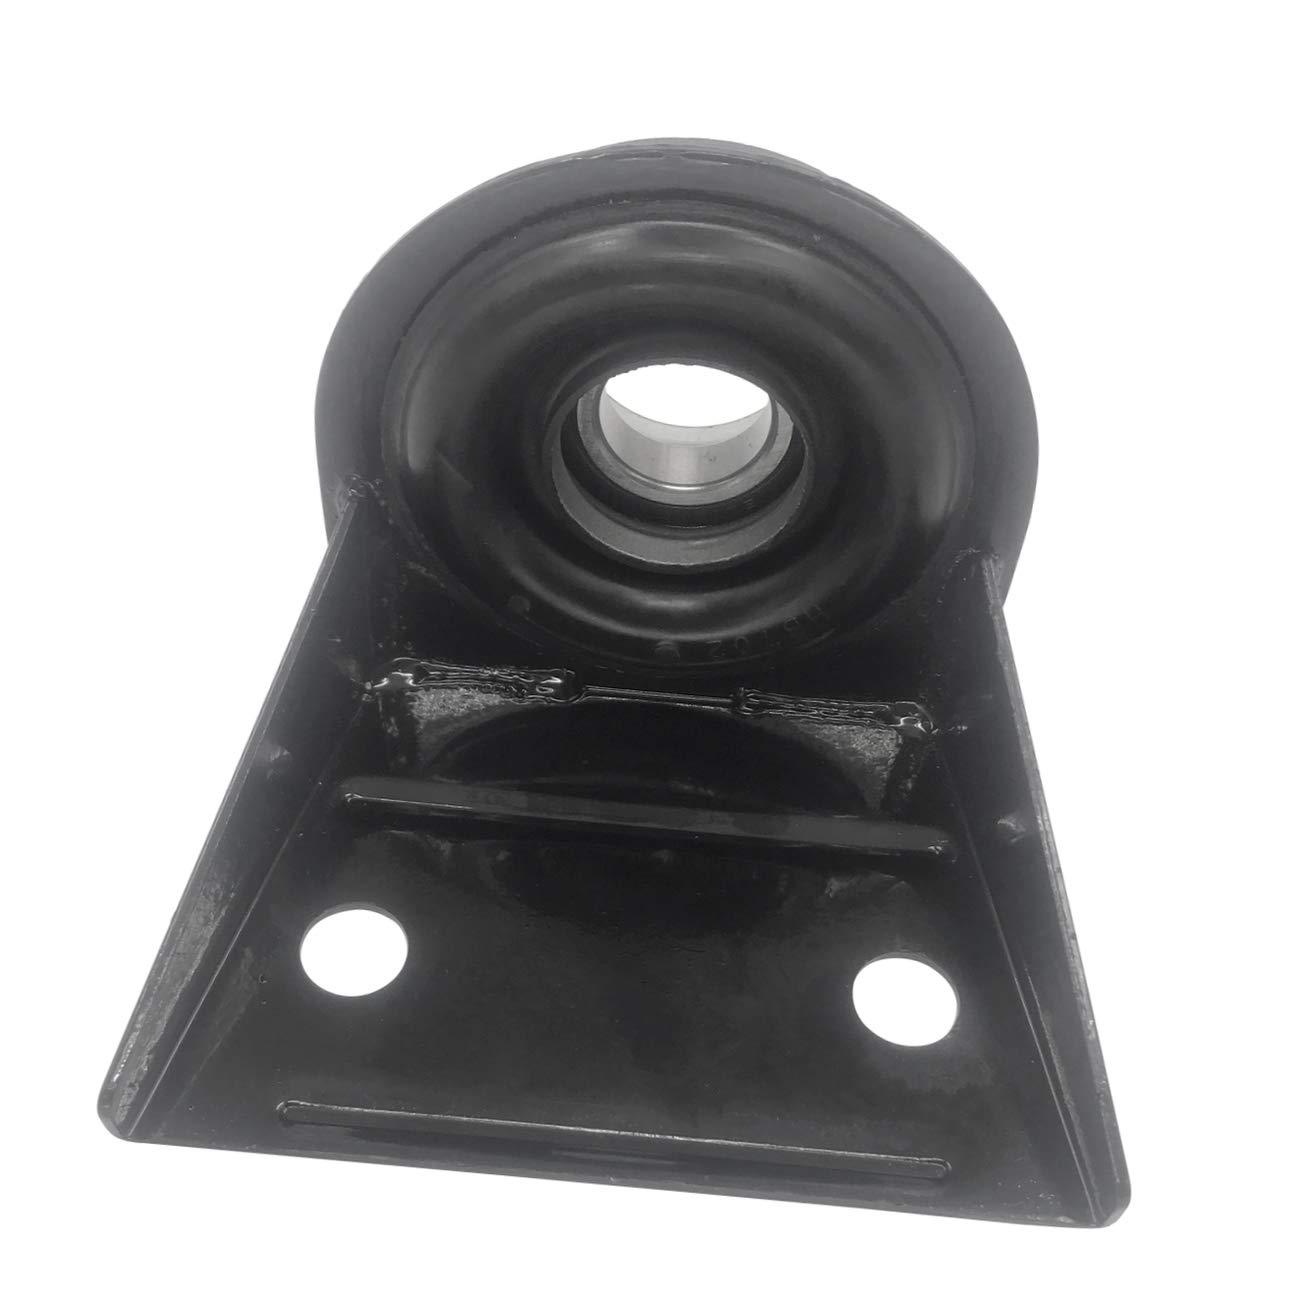 SKP SK934702 Drive Shaft Center Support Bearing